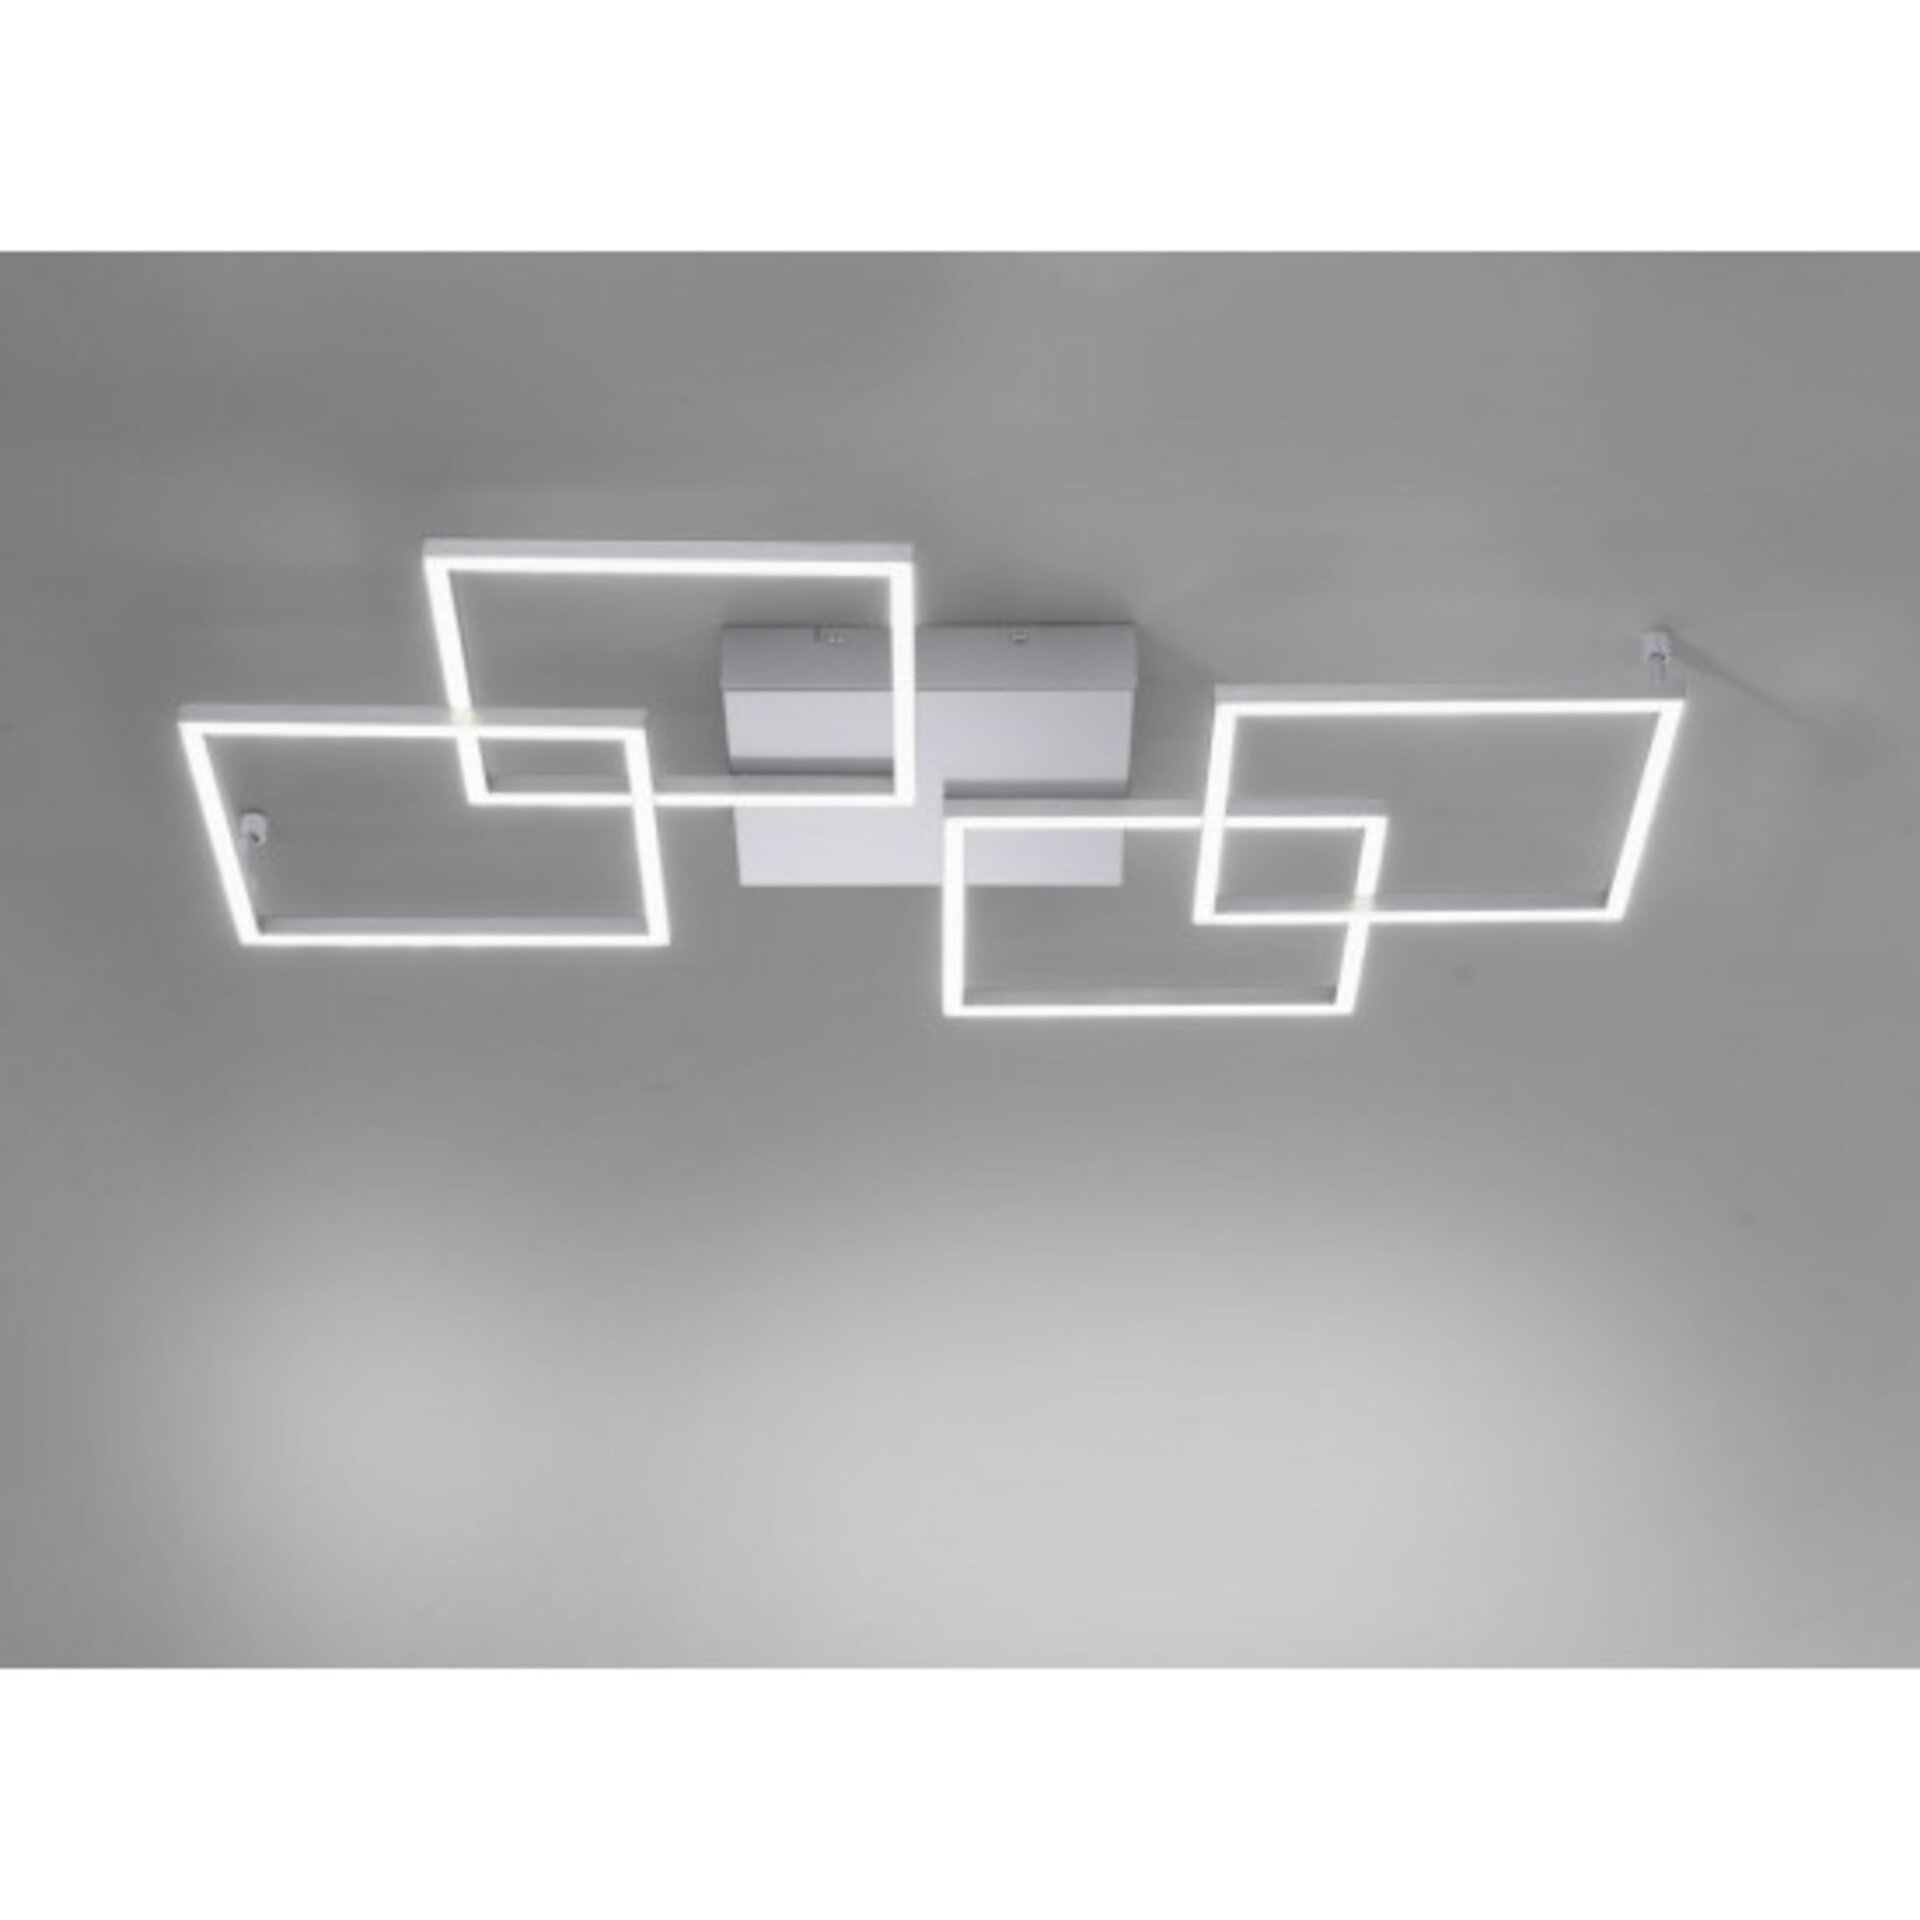 Deckenleuchte INIGO Paul Neuhaus Metall 52 x 7 x 81 cm